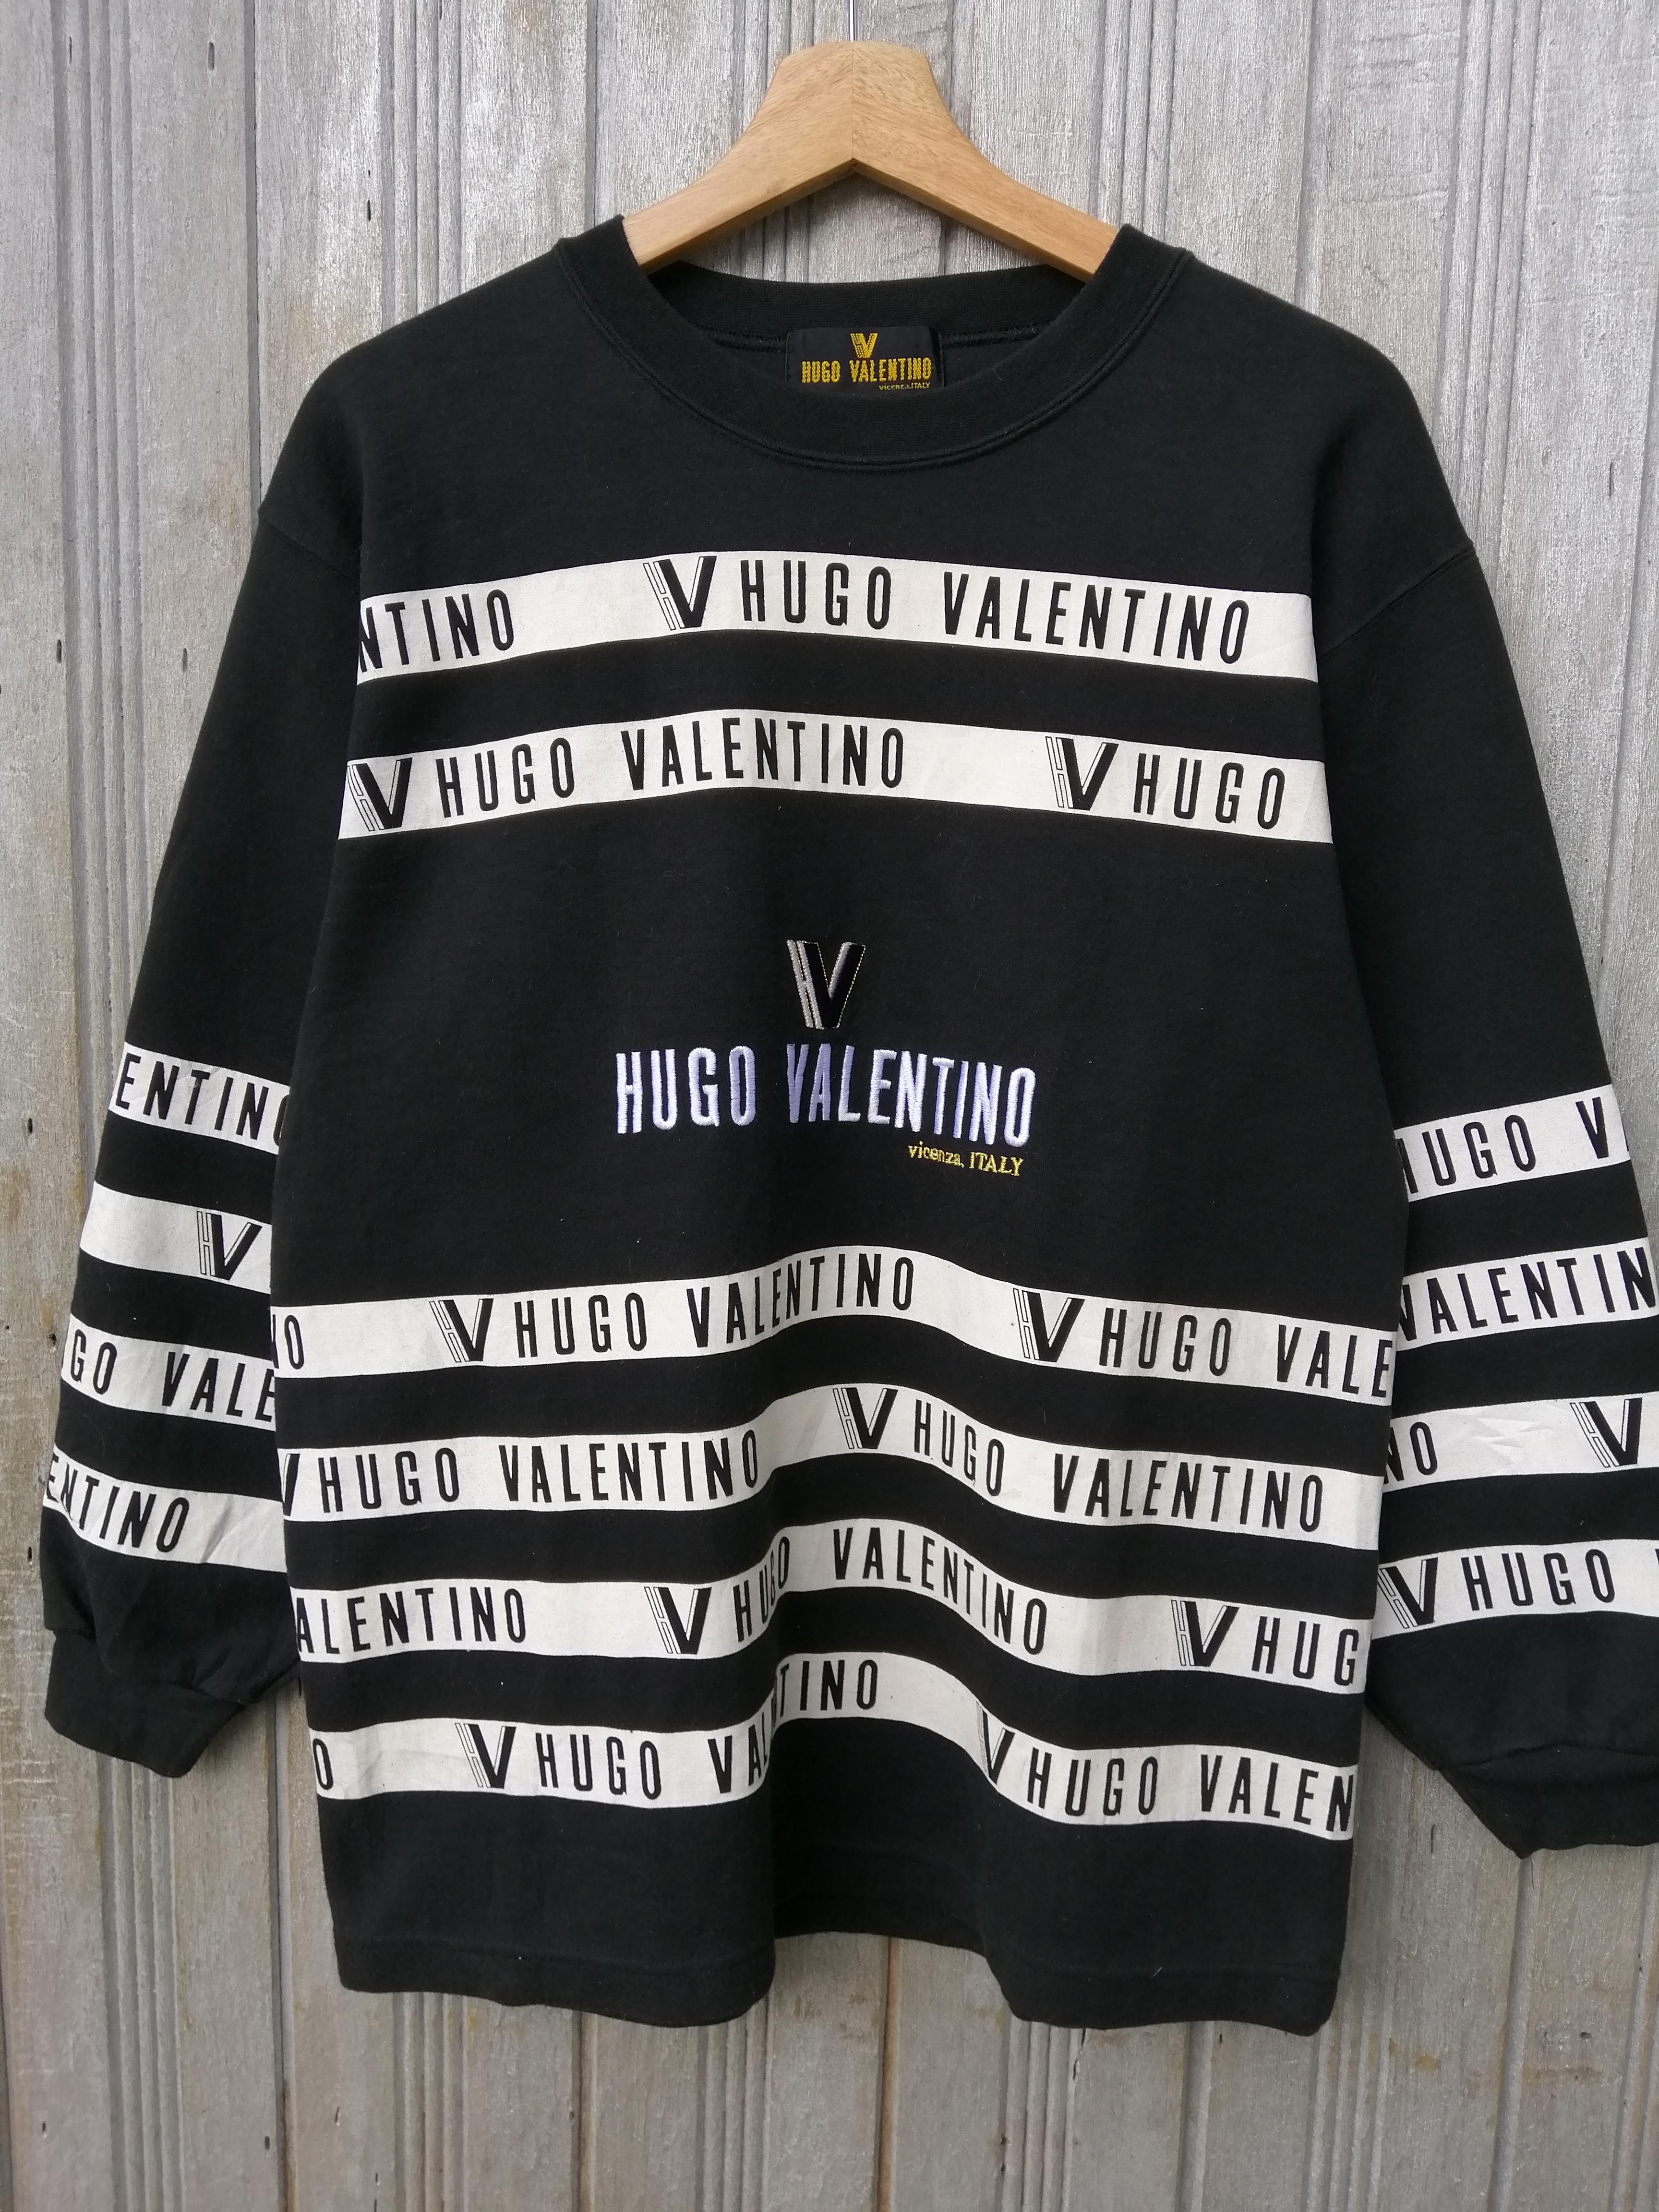 Rare!! Vintage Hugo Valentino Italy Sweatshirt Big Logo Embroidery Pullover Crewneck Valentino Italy